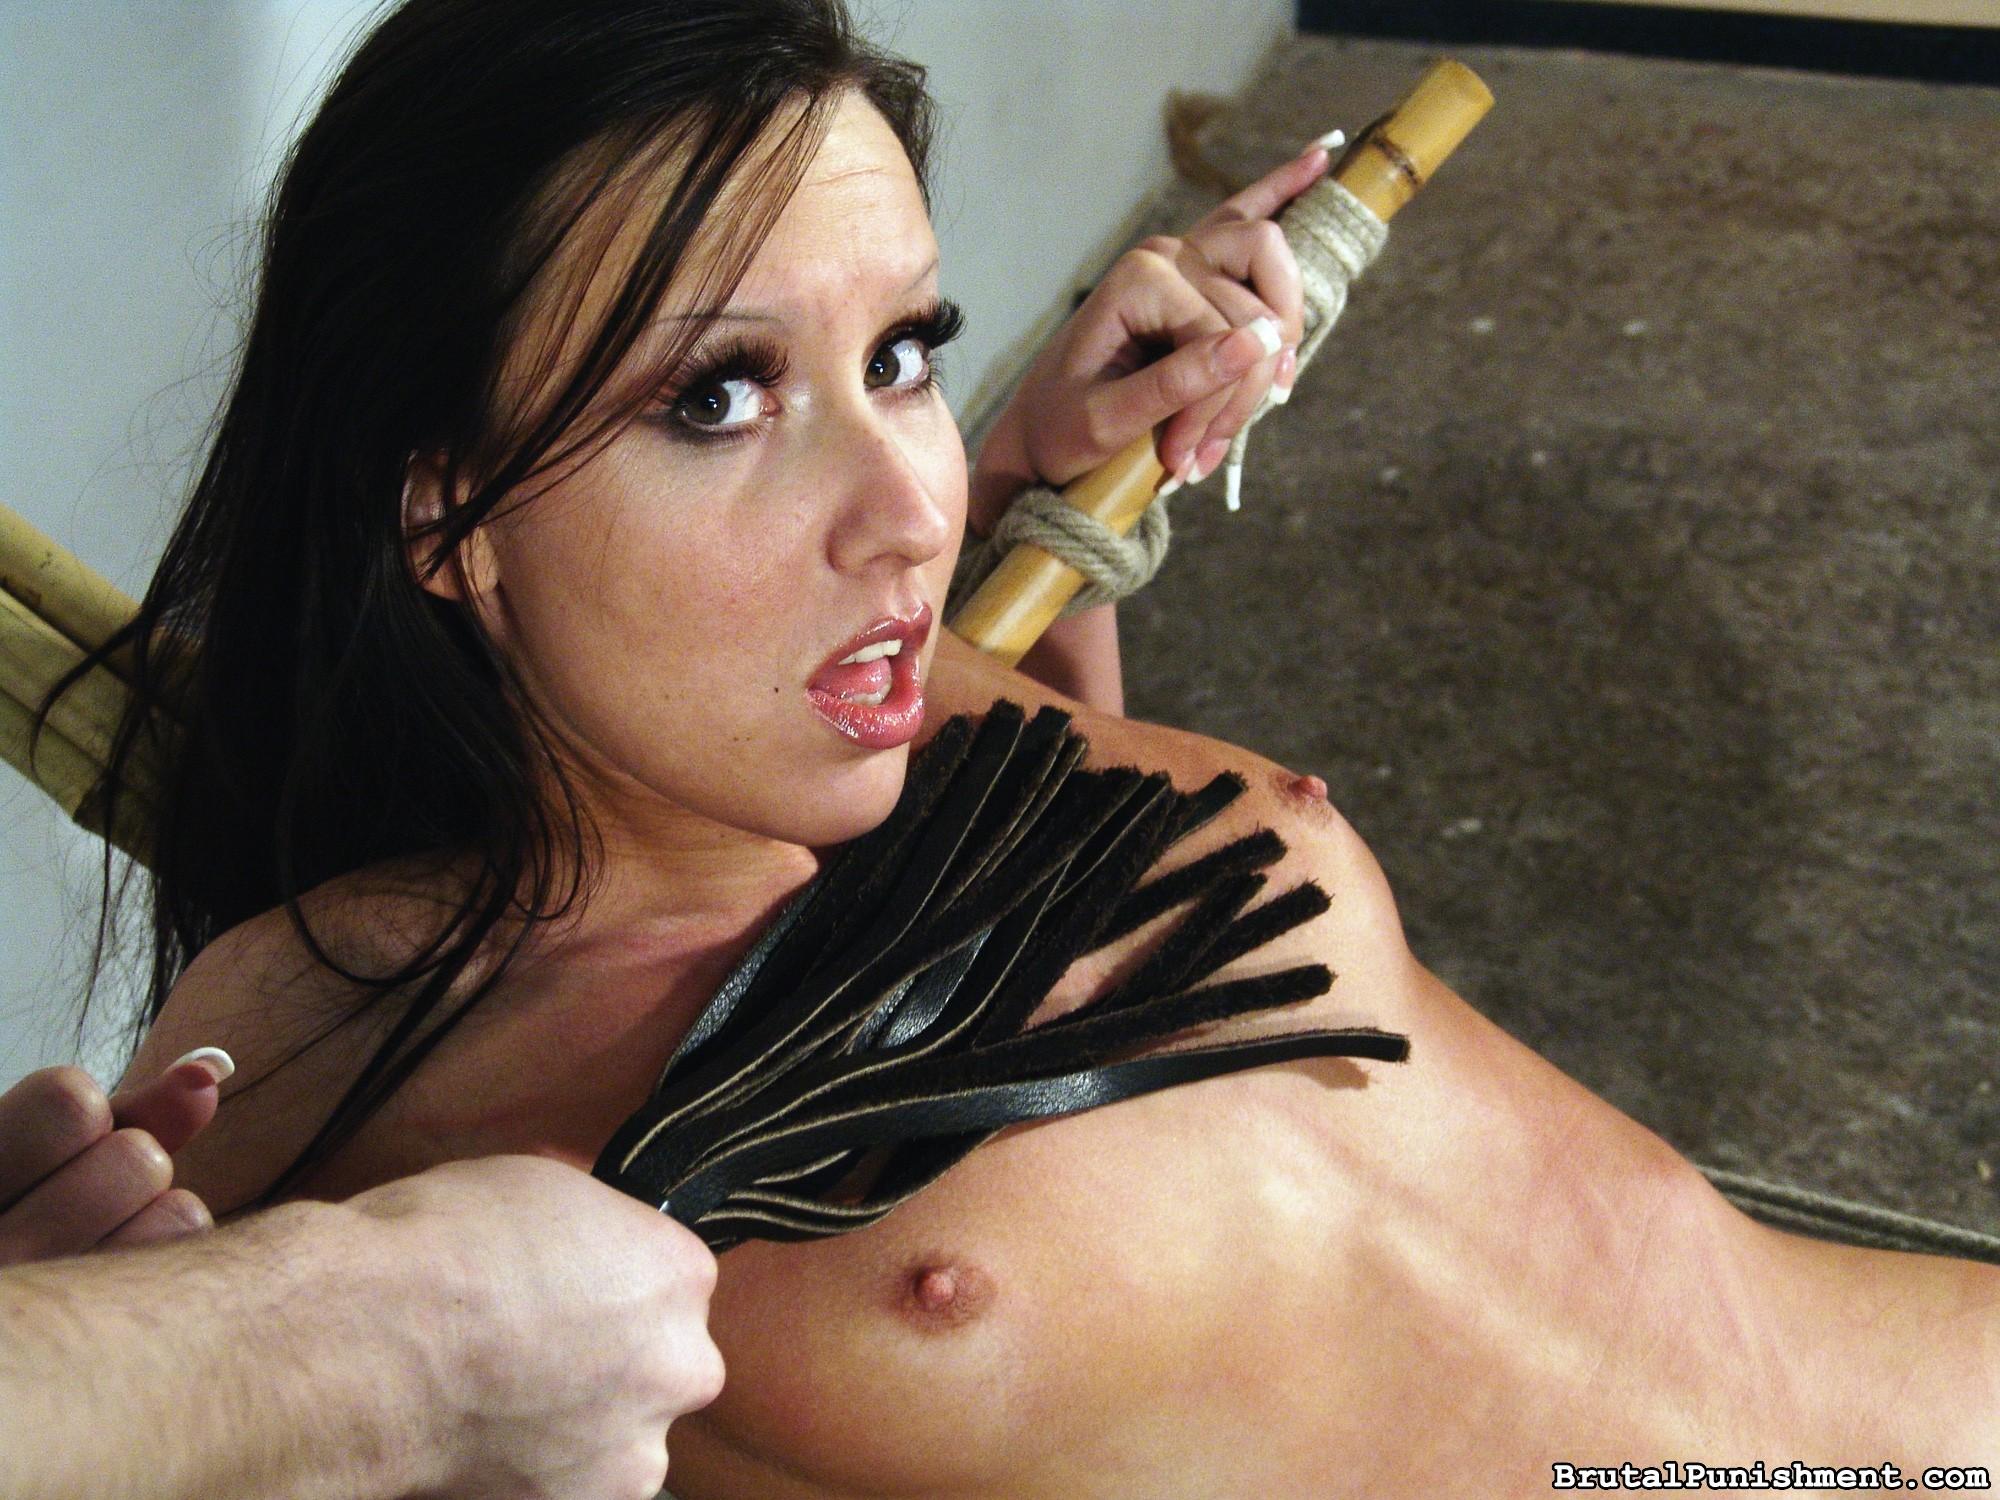 Wild Agony Bi-atch Nicole Suffers Some Other Restrain Bondage Consultation